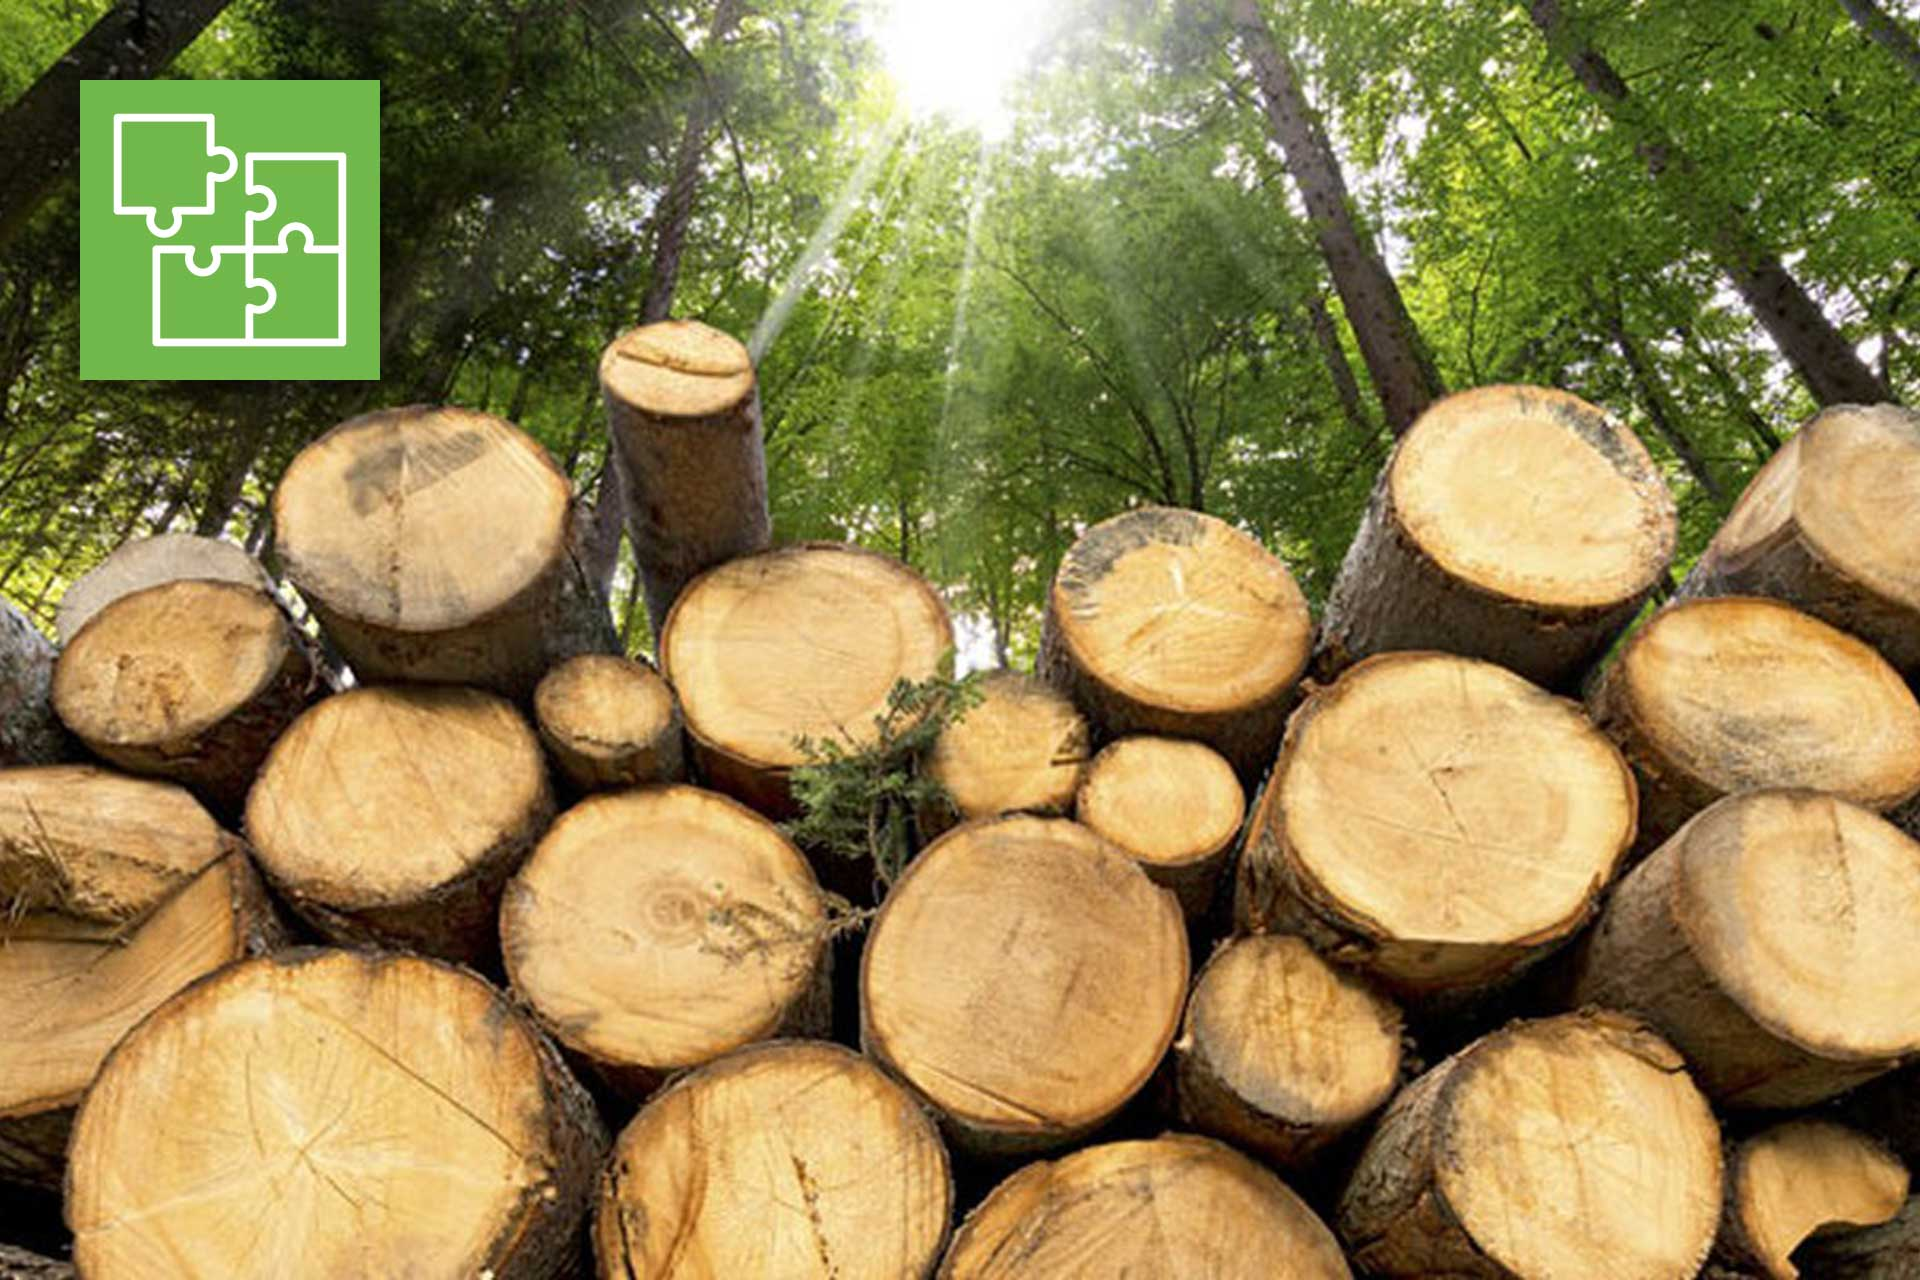 Filiera legno agroenergia. Quattro workshop di Agricoltura è Vita Etruria, il calendario